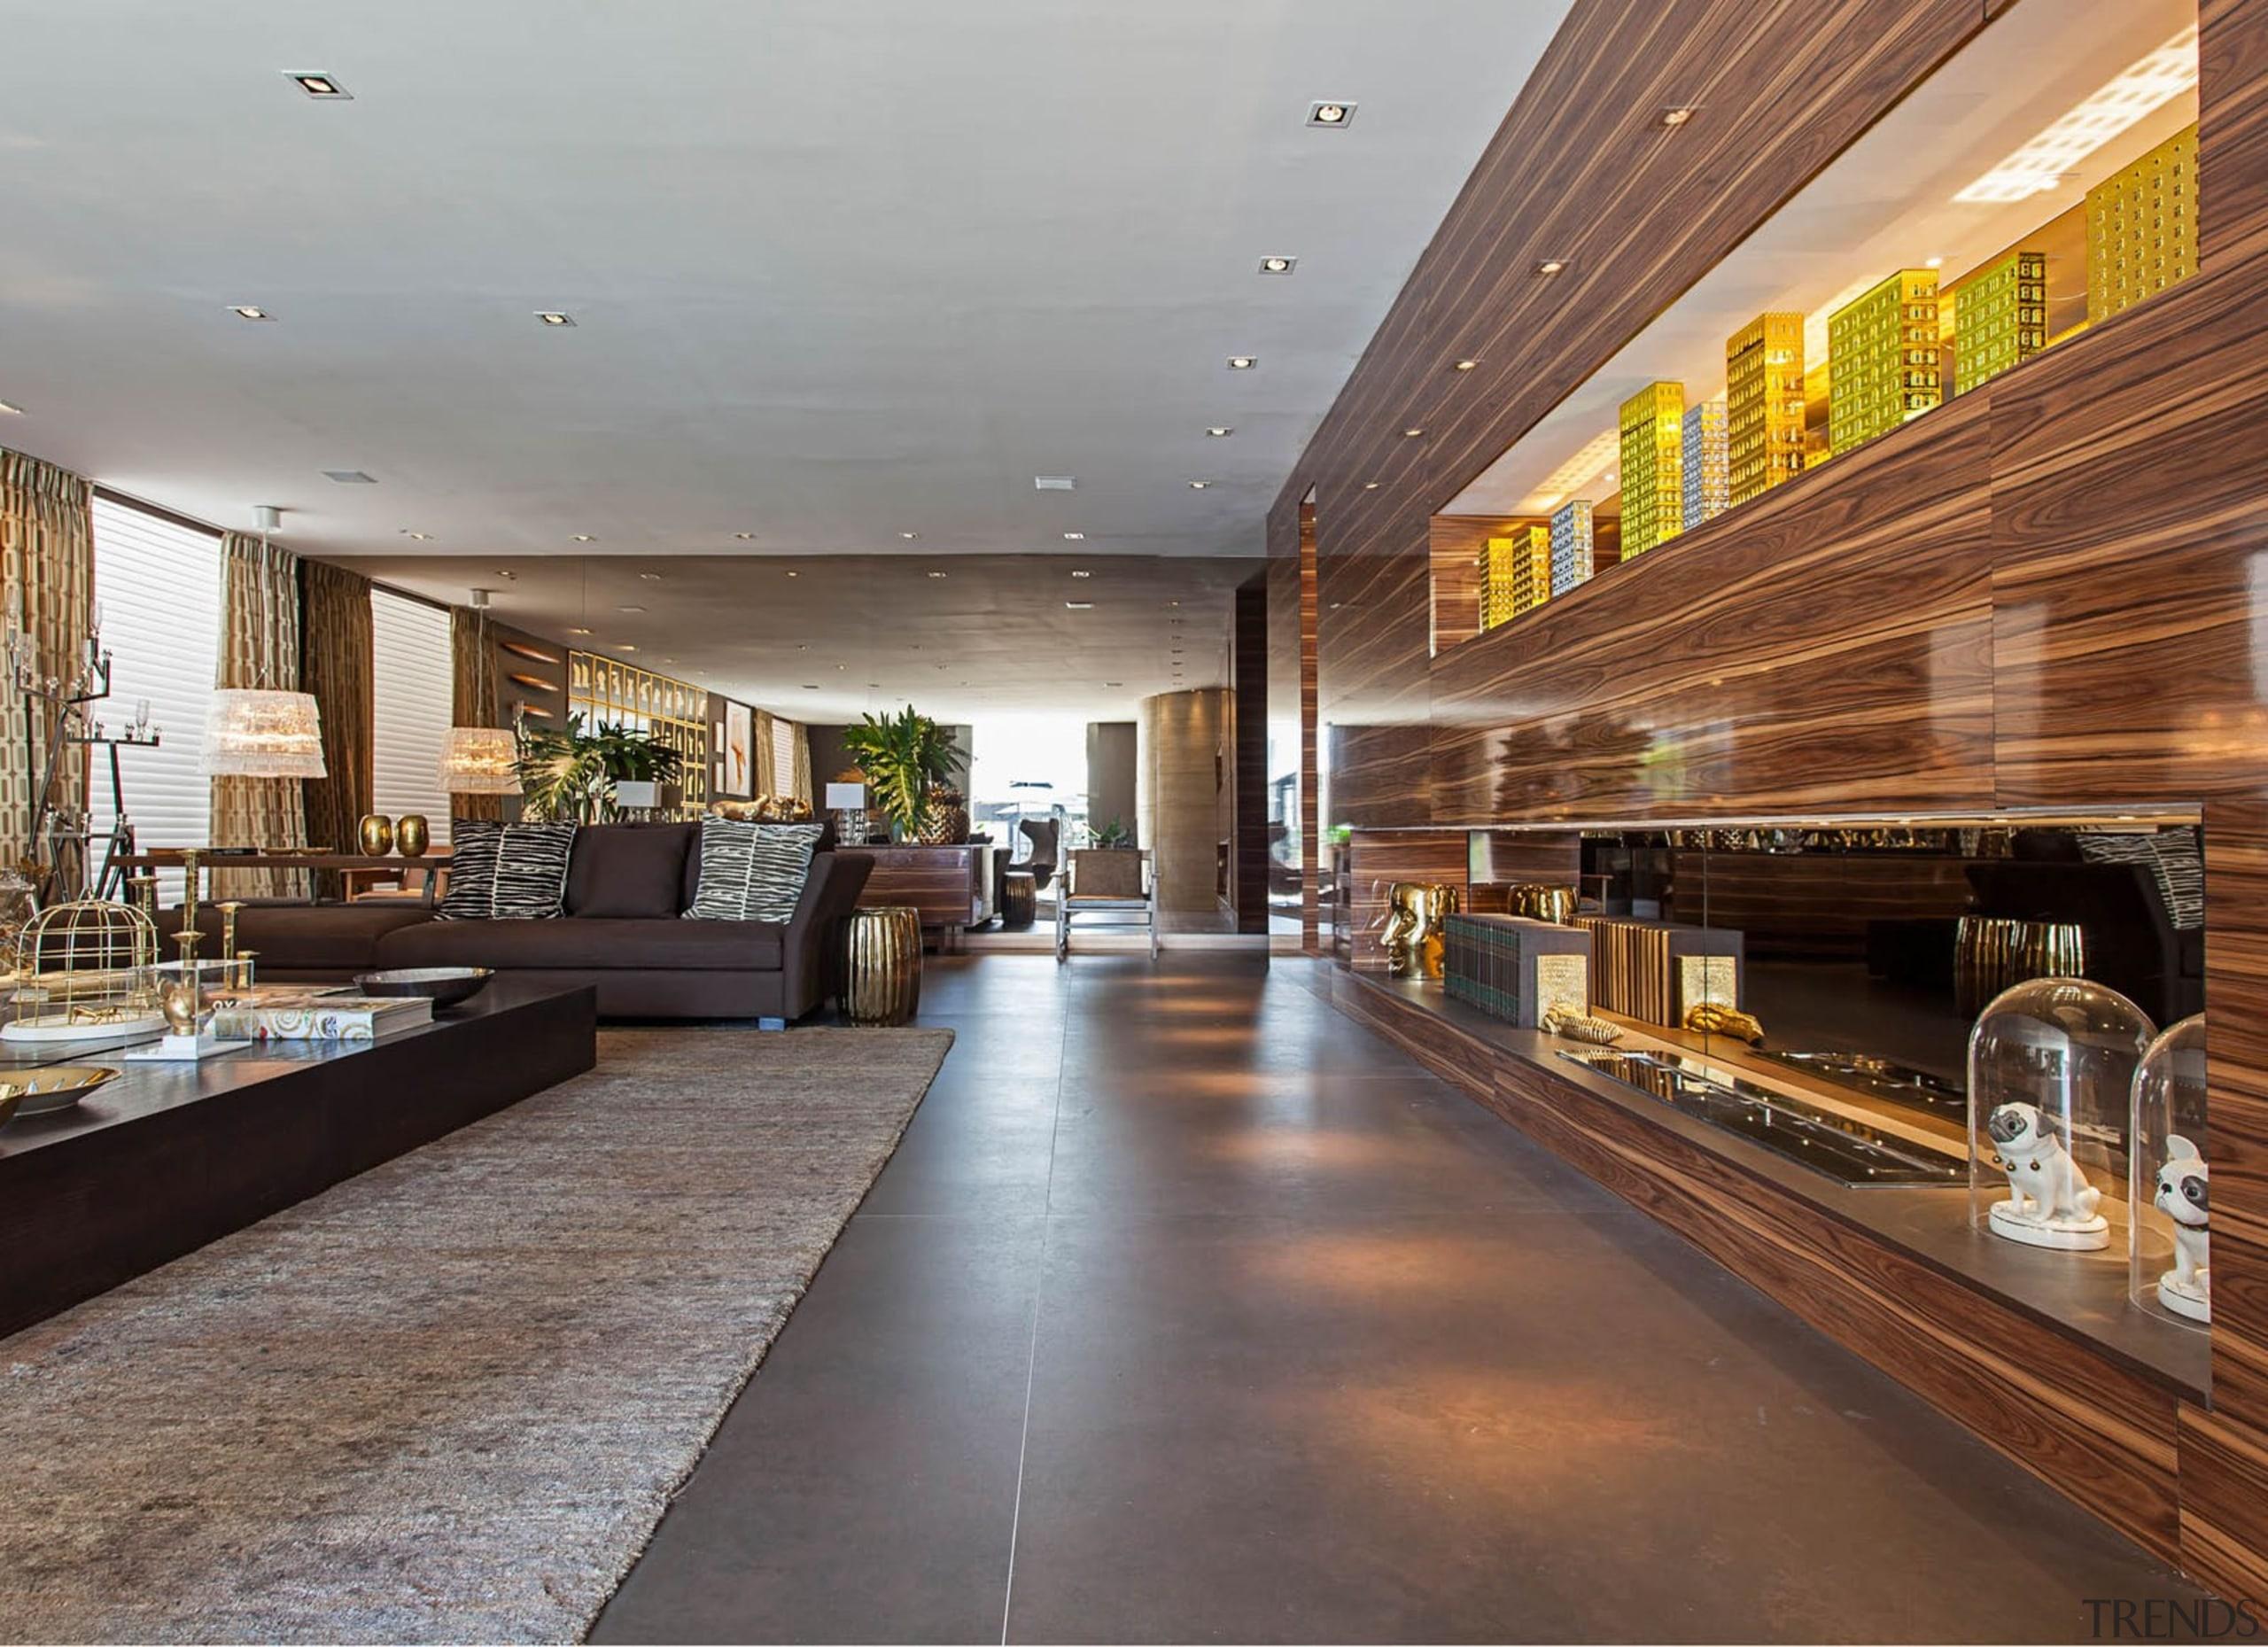 Suelo Keranium 3 - Suelo Keranium 3 - ceiling, interior design, lobby, real estate, gray, brown